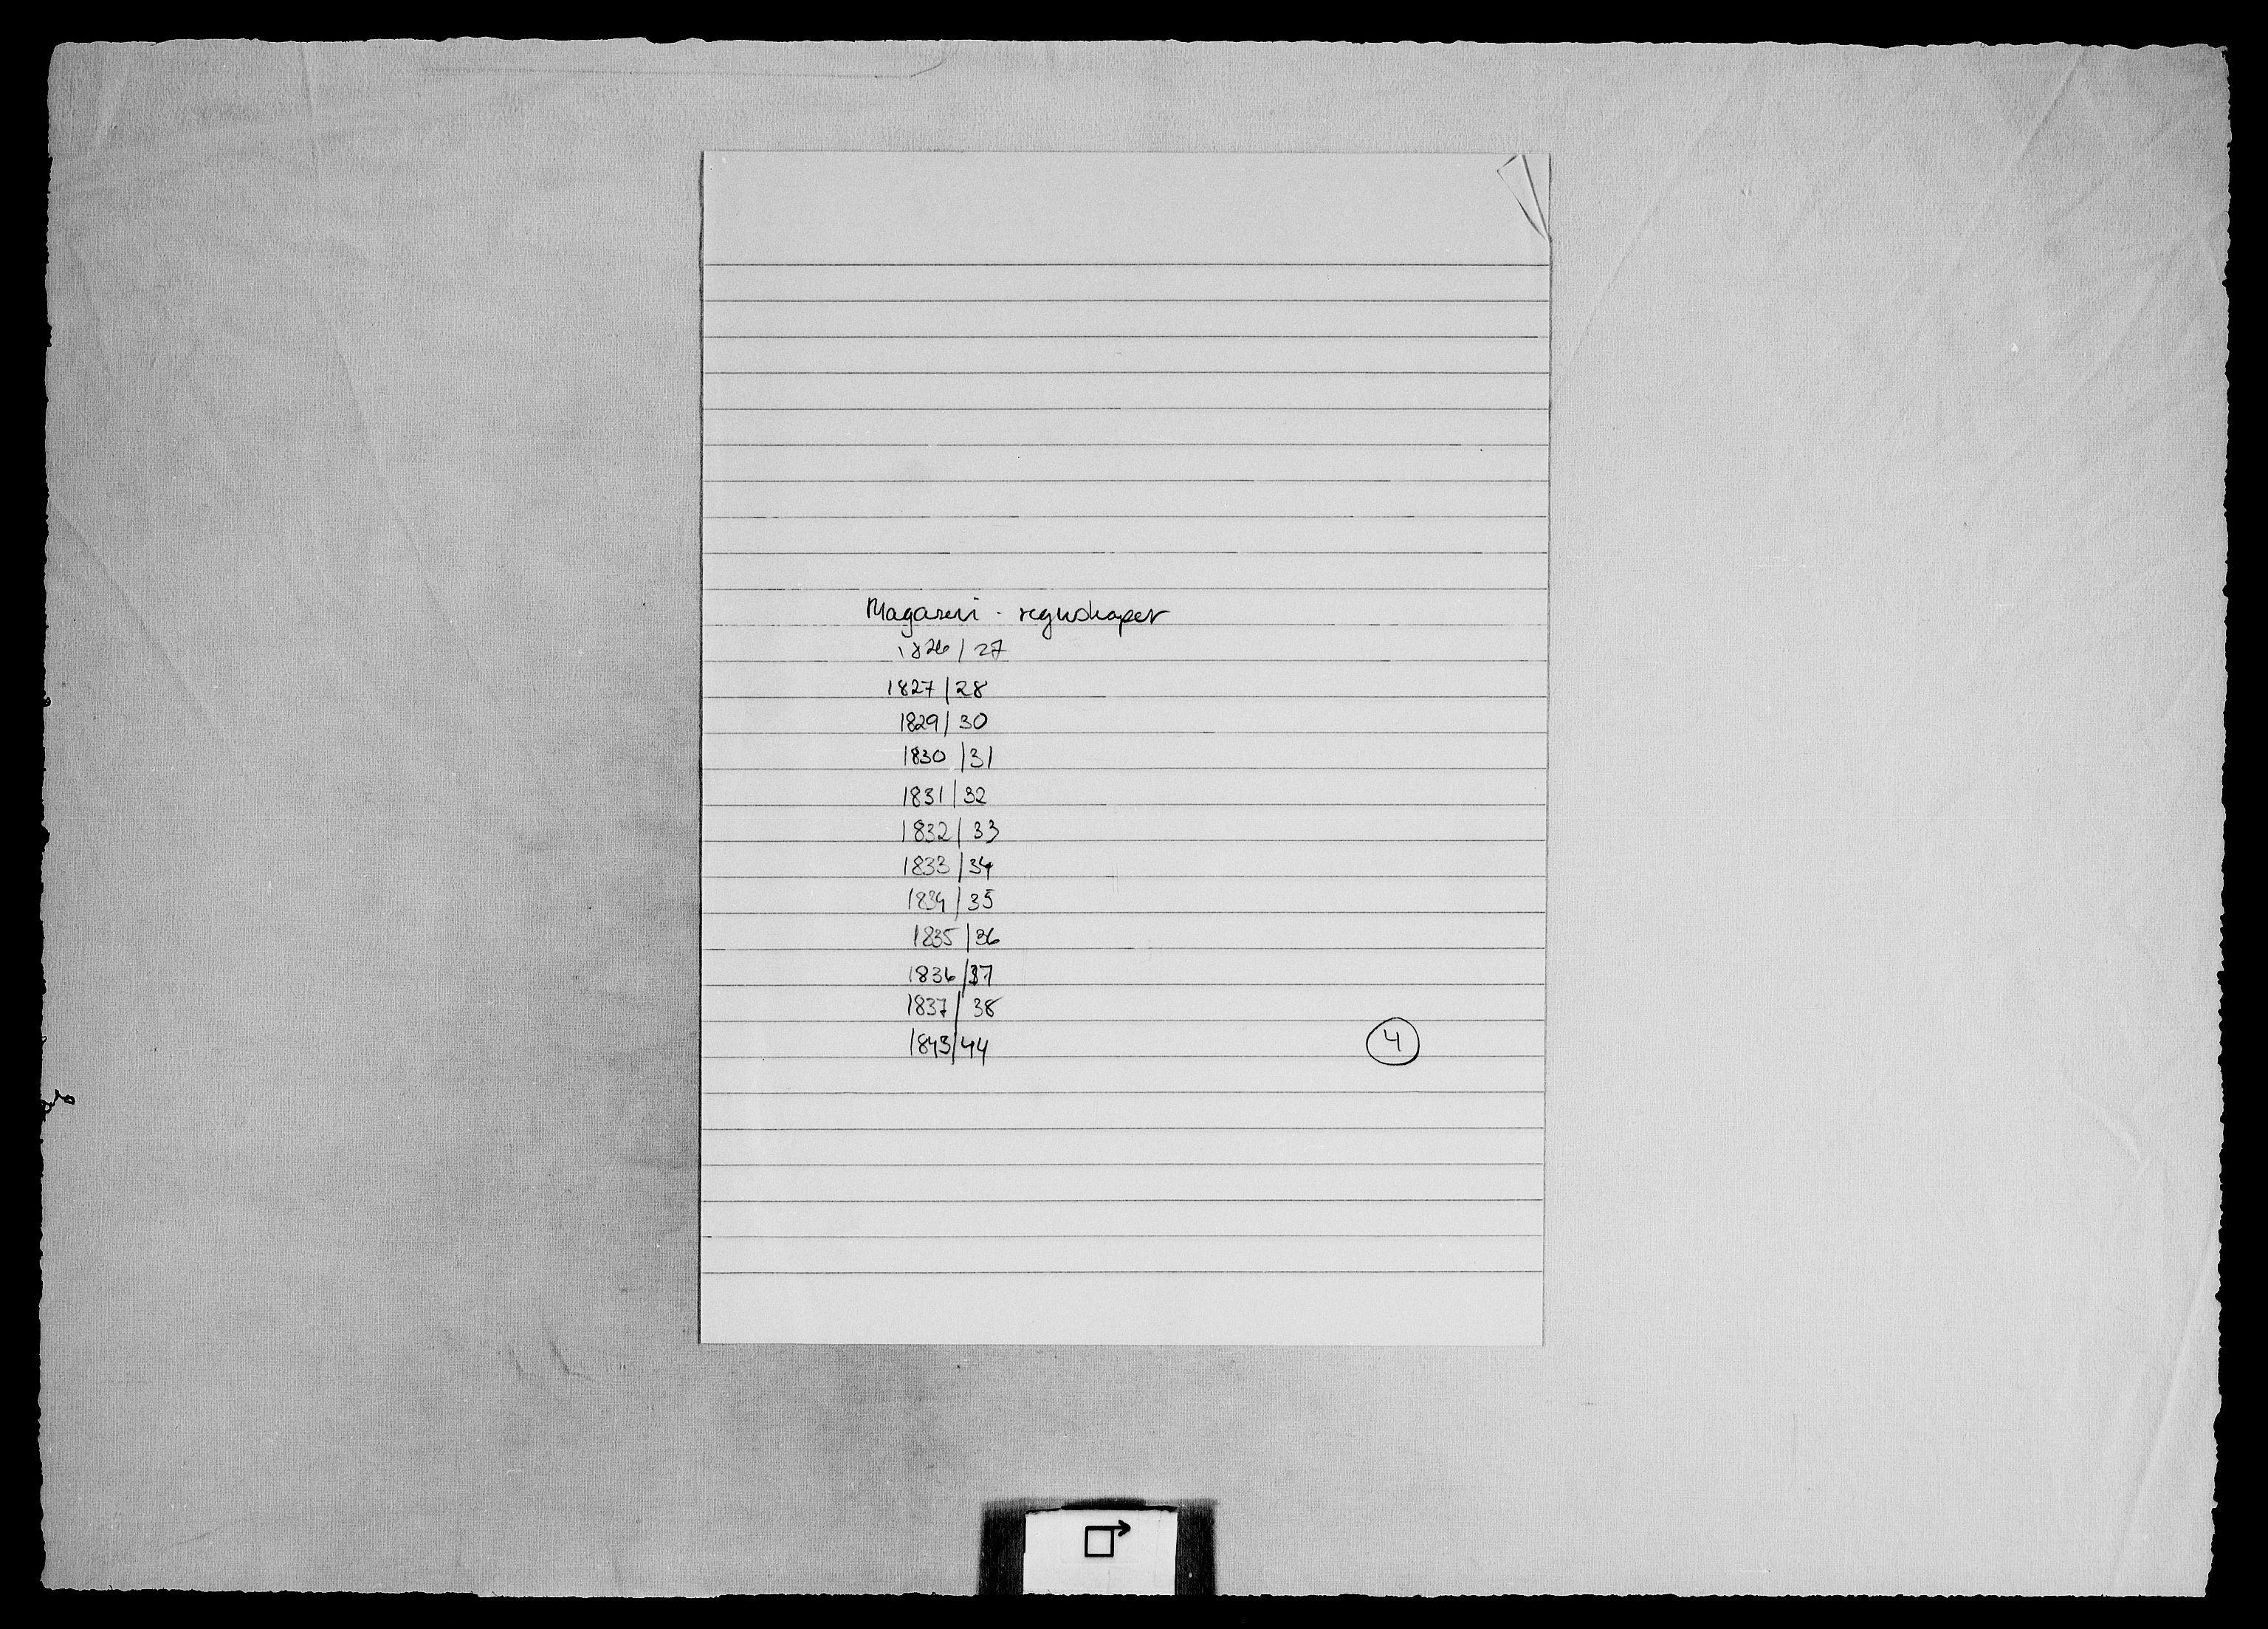 RA, Modums Blaafarveværk, G/Gd/Gdd/L0301, 1822-1849, s. 2